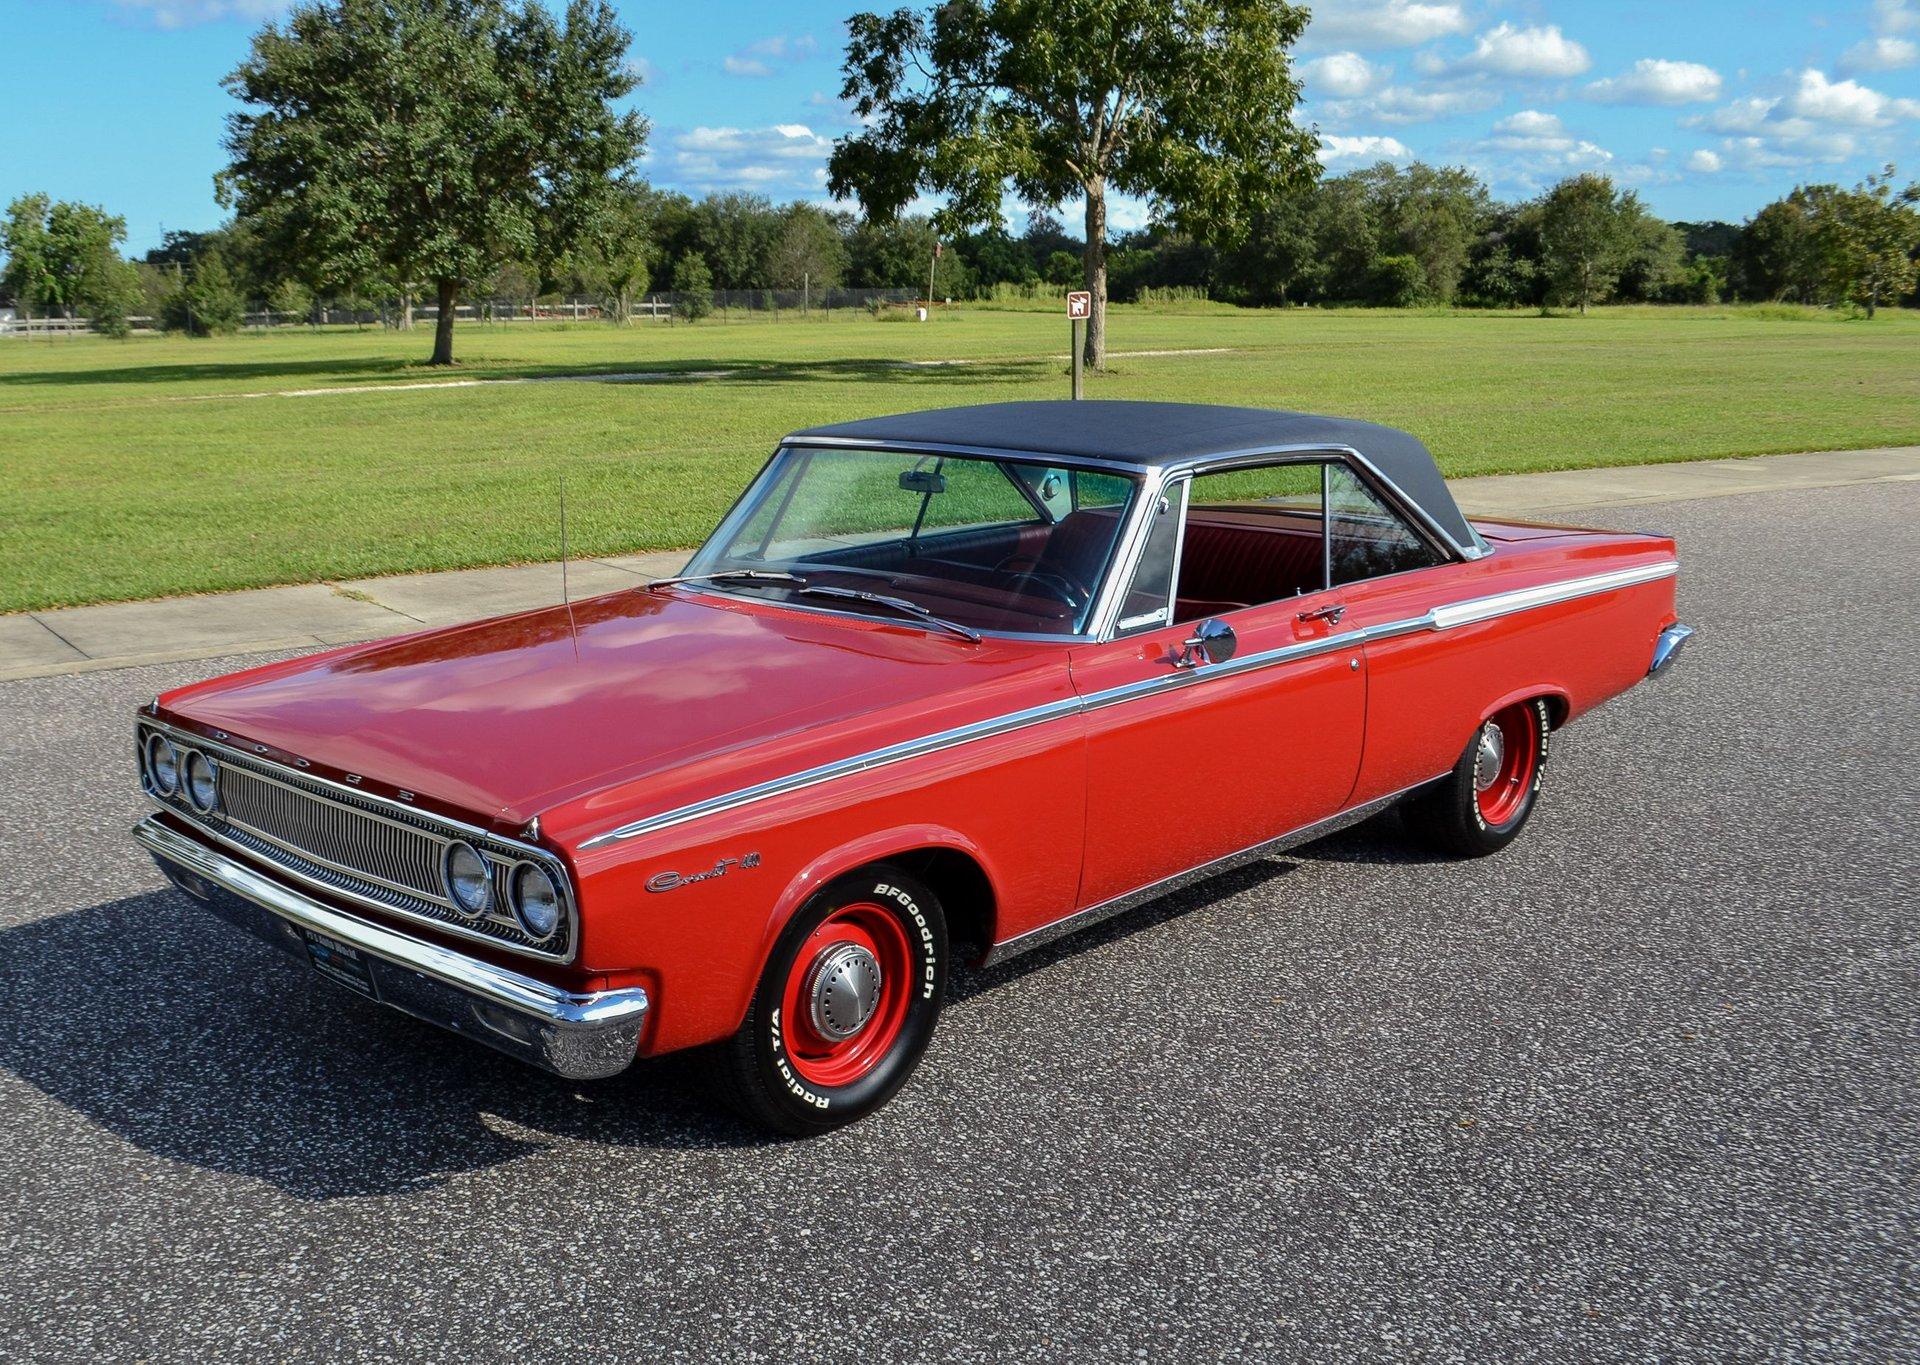 1965 Dodge Coronet Pj S Auto World Classic Cars For Sale